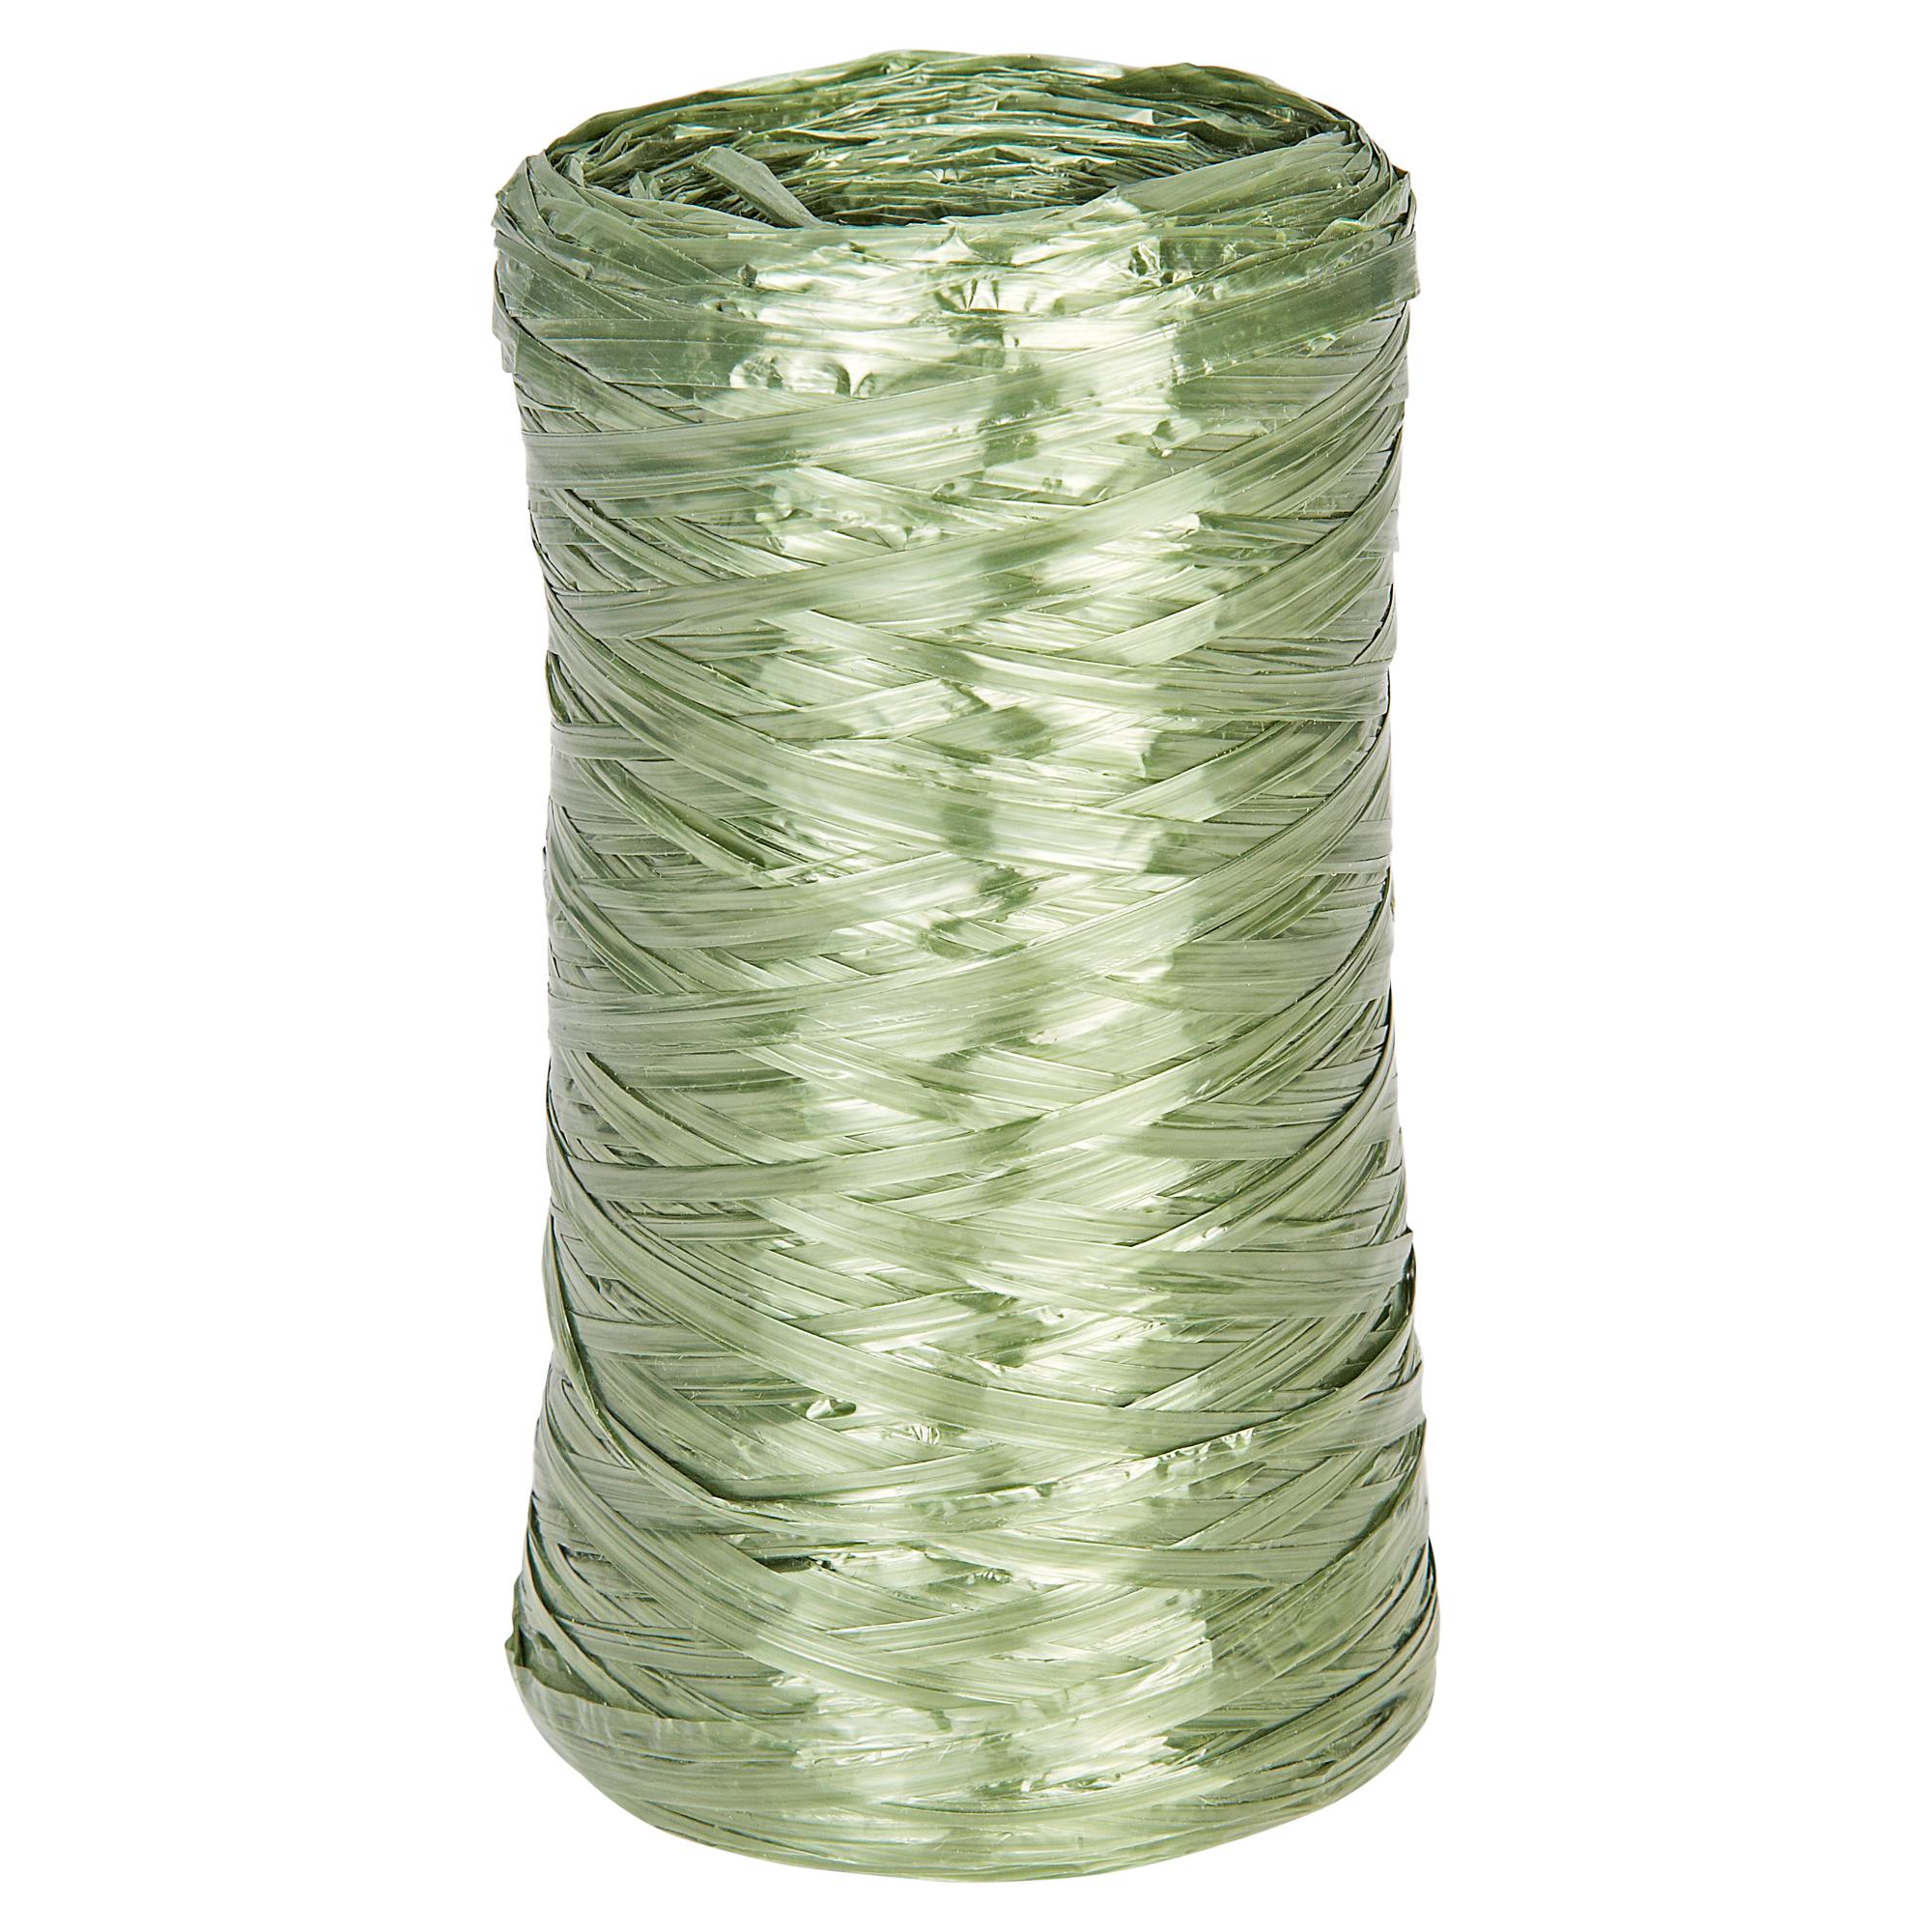 grün Jutekordel 2 m x 12 mm 2 m